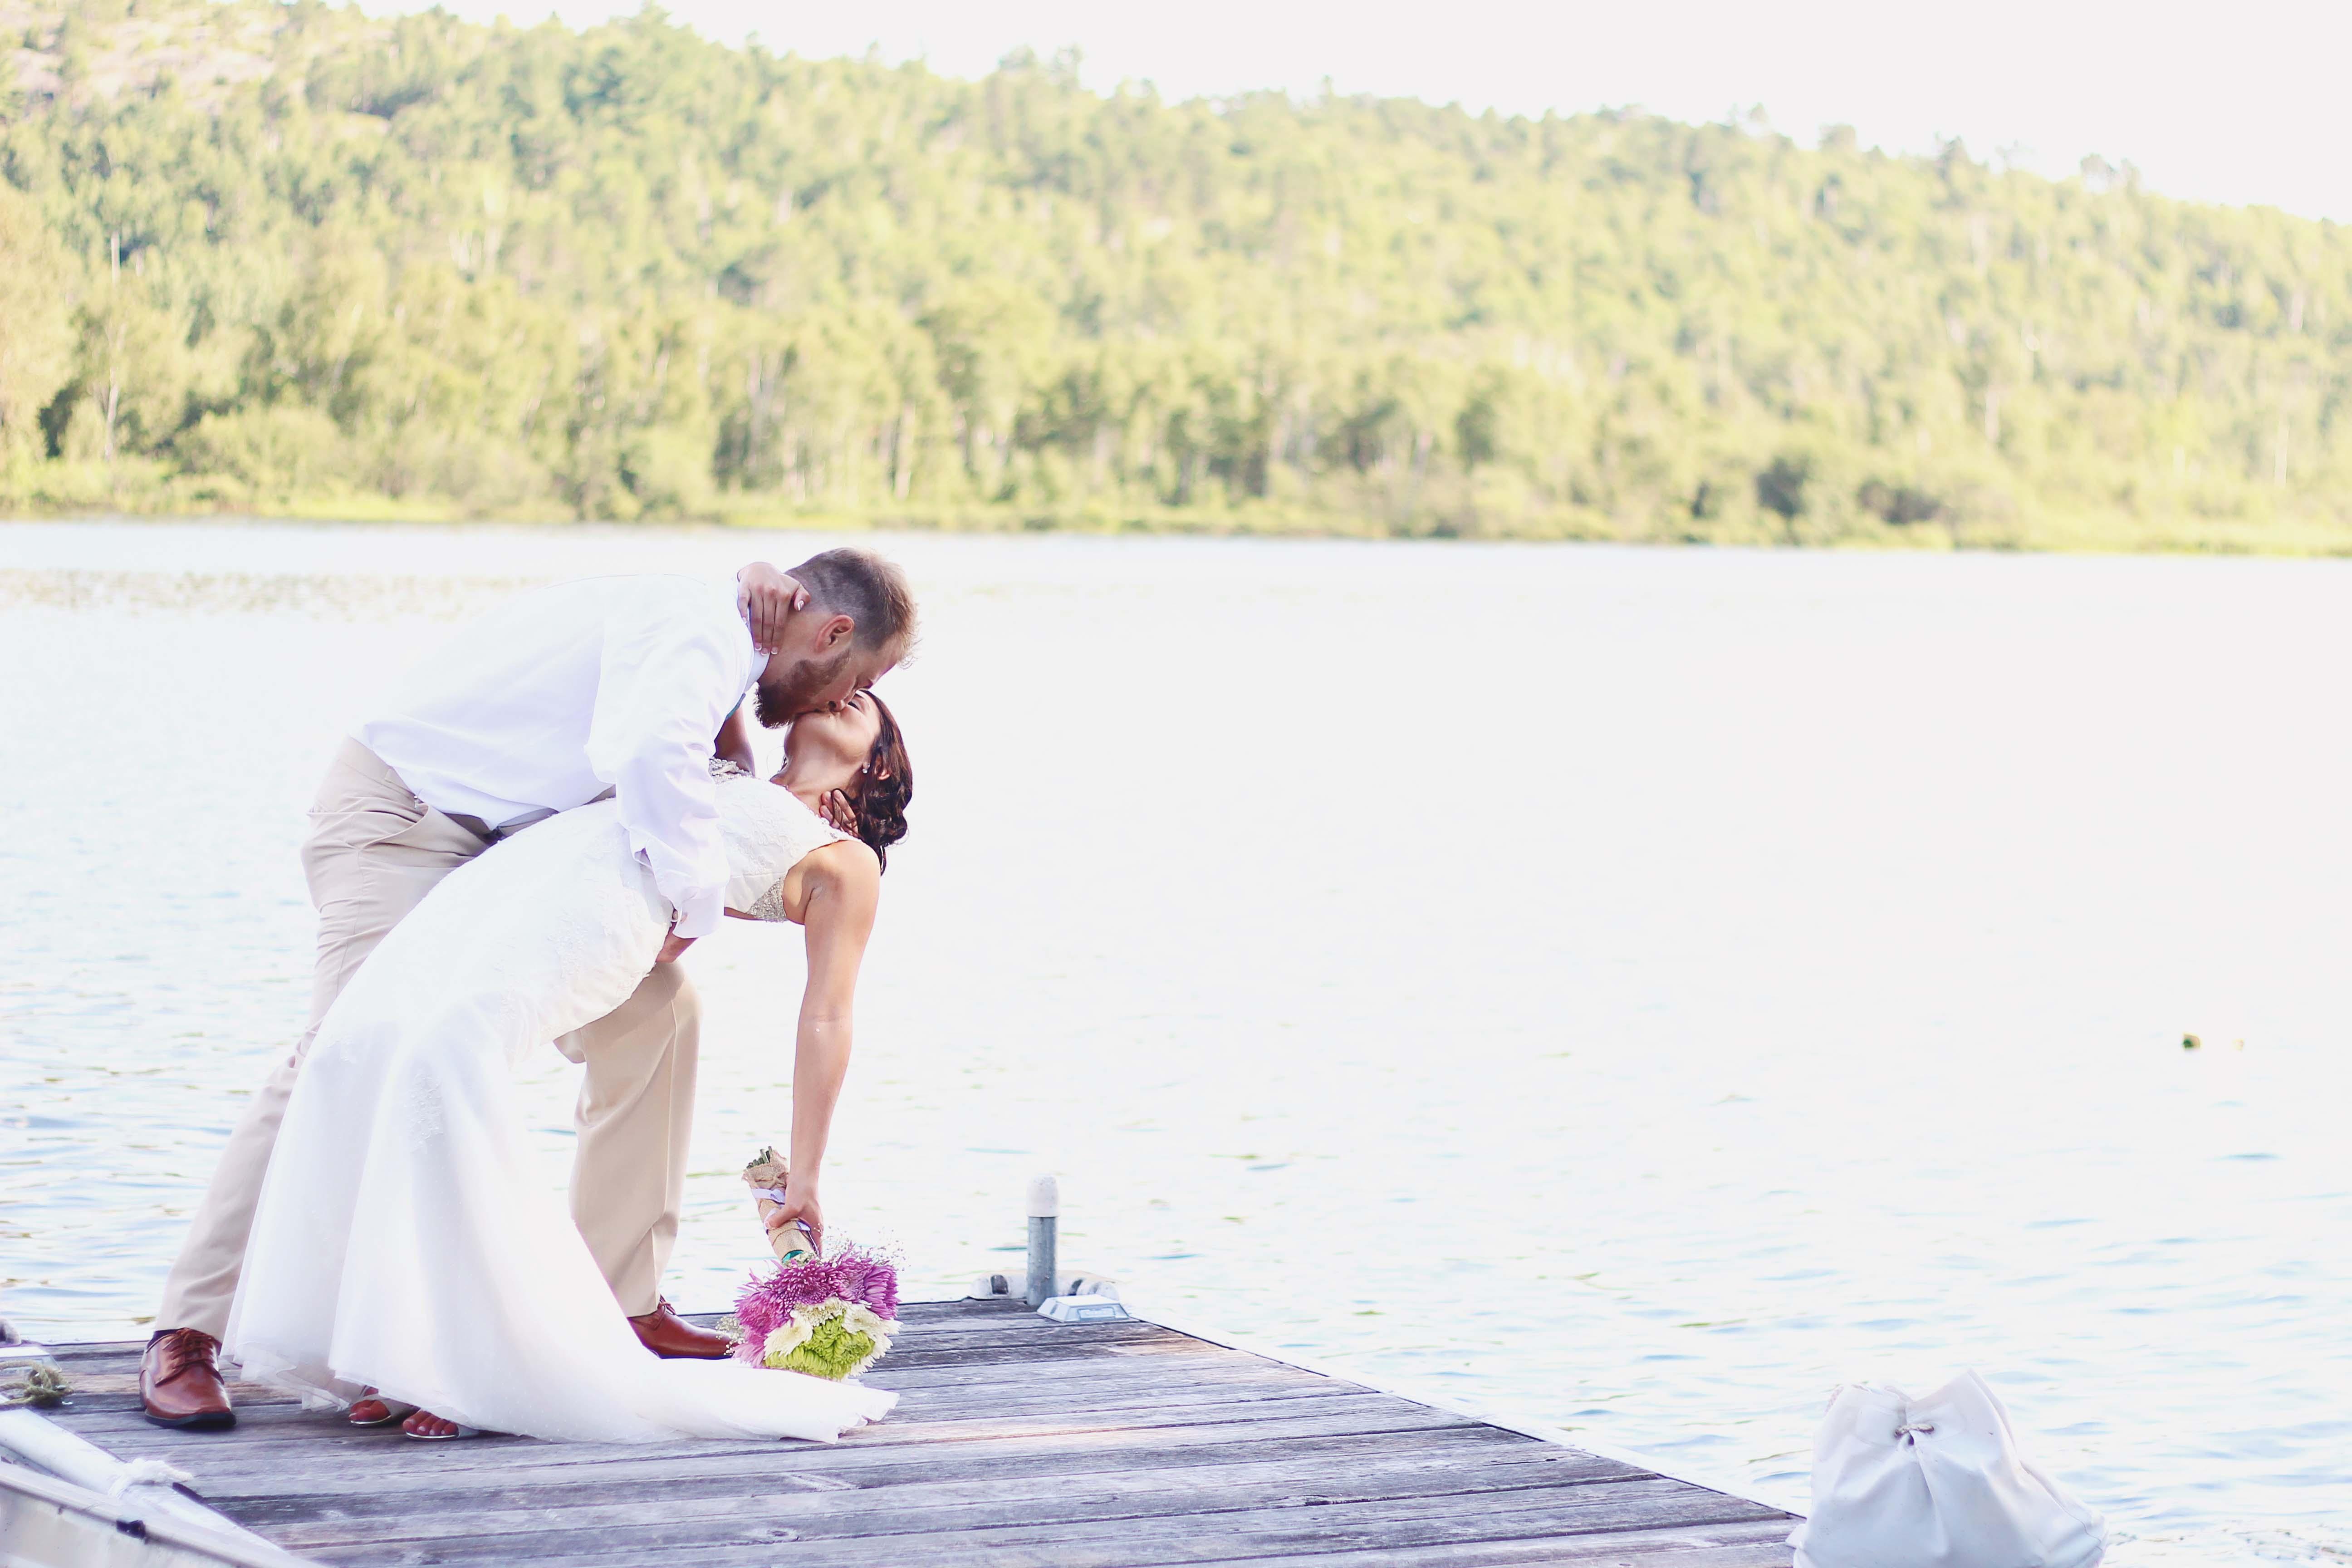 wedding photographer in Sudbury, ON